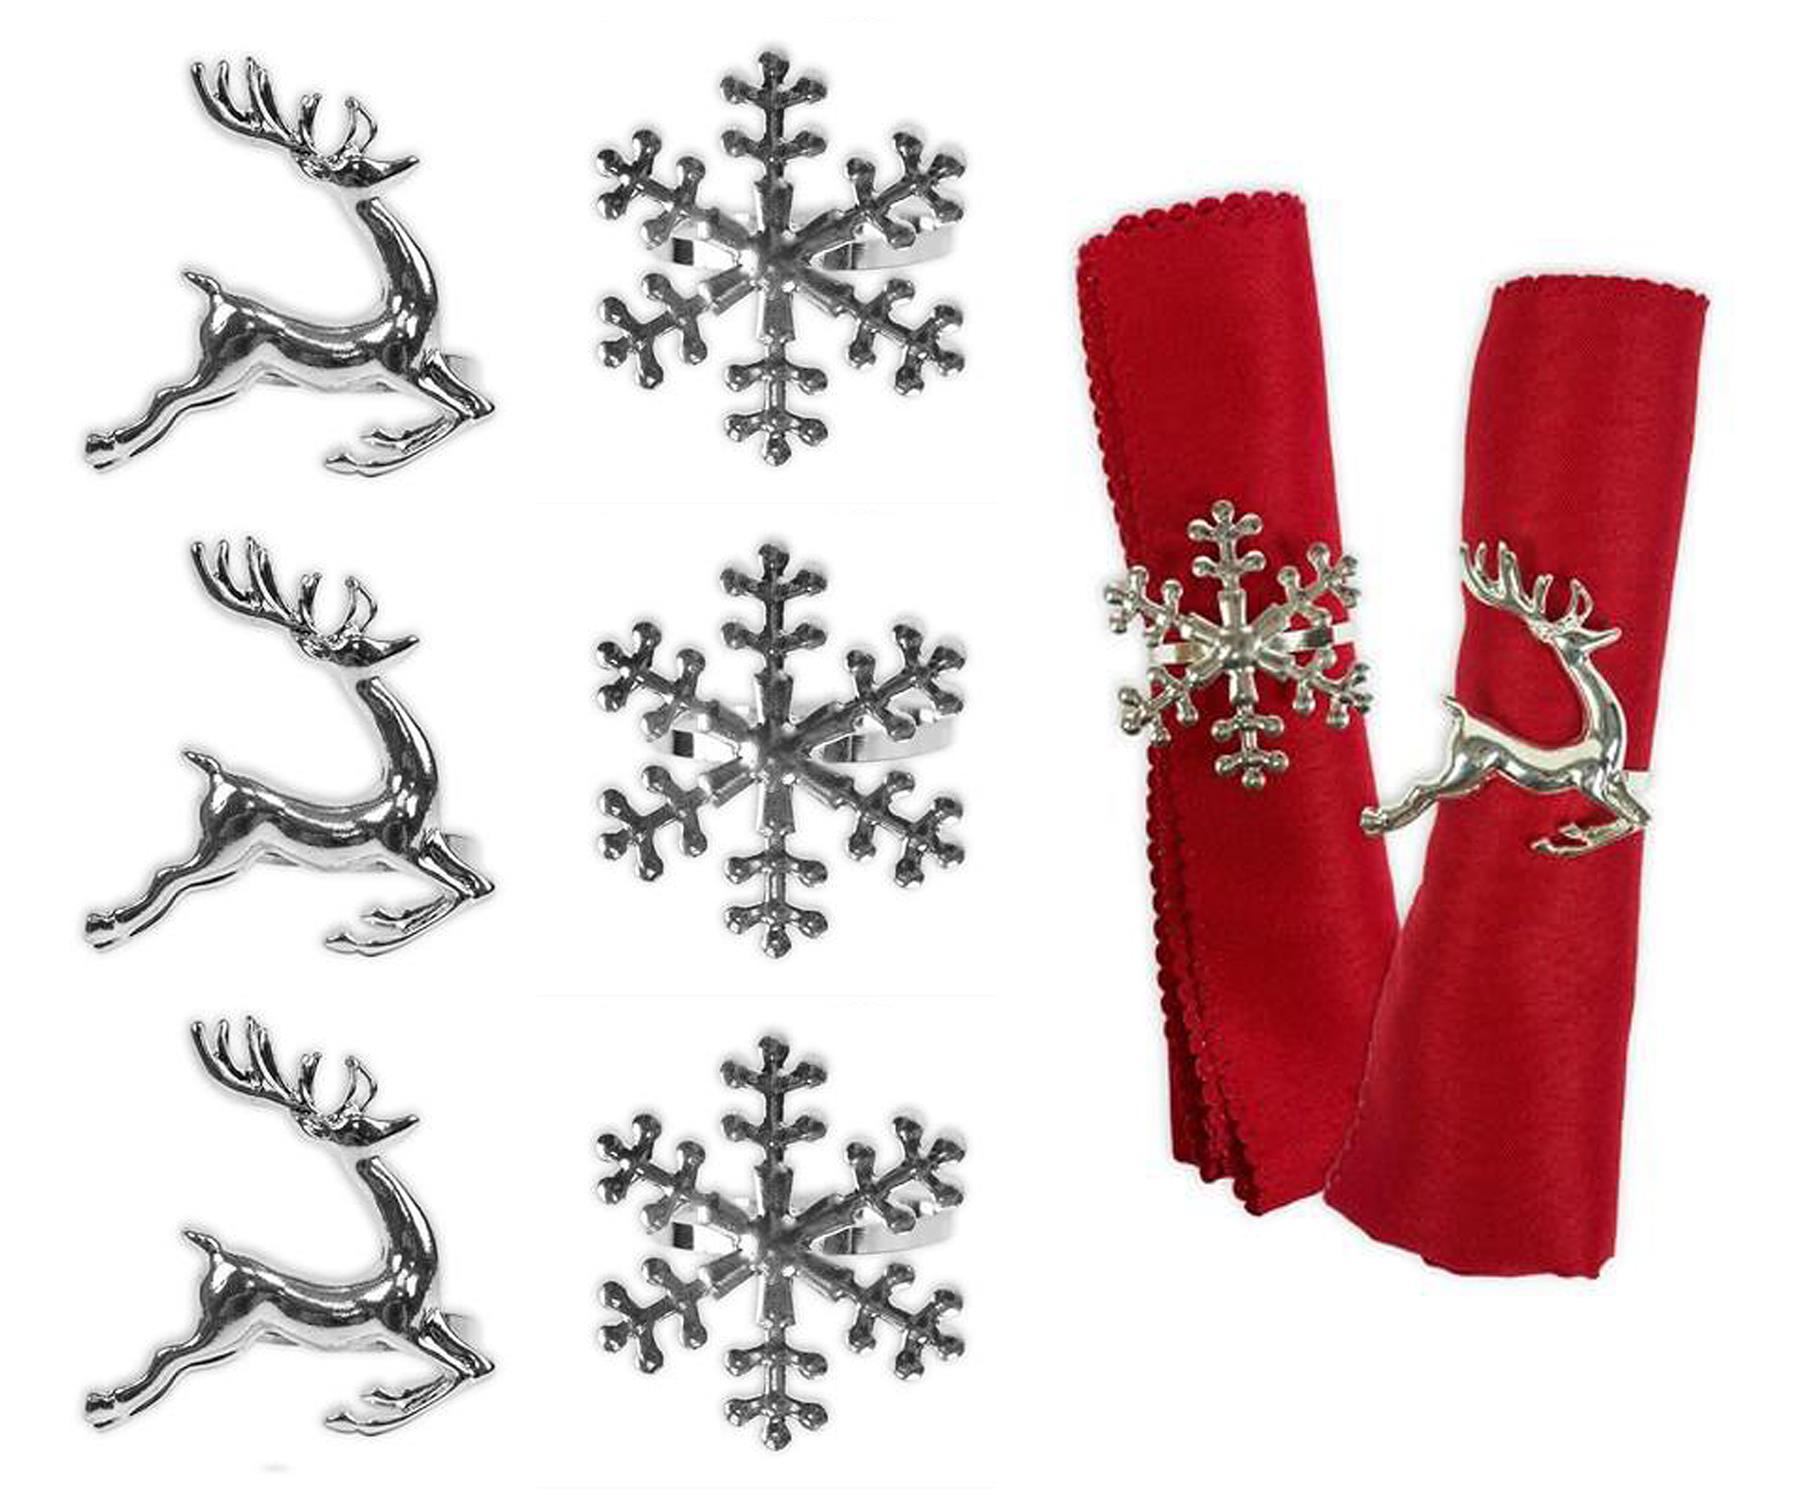 Set Of 6 Napkin Rings Snowflake Reindeer Xmas Silver Metal Elegant Table Set 5015302145170 Ebay